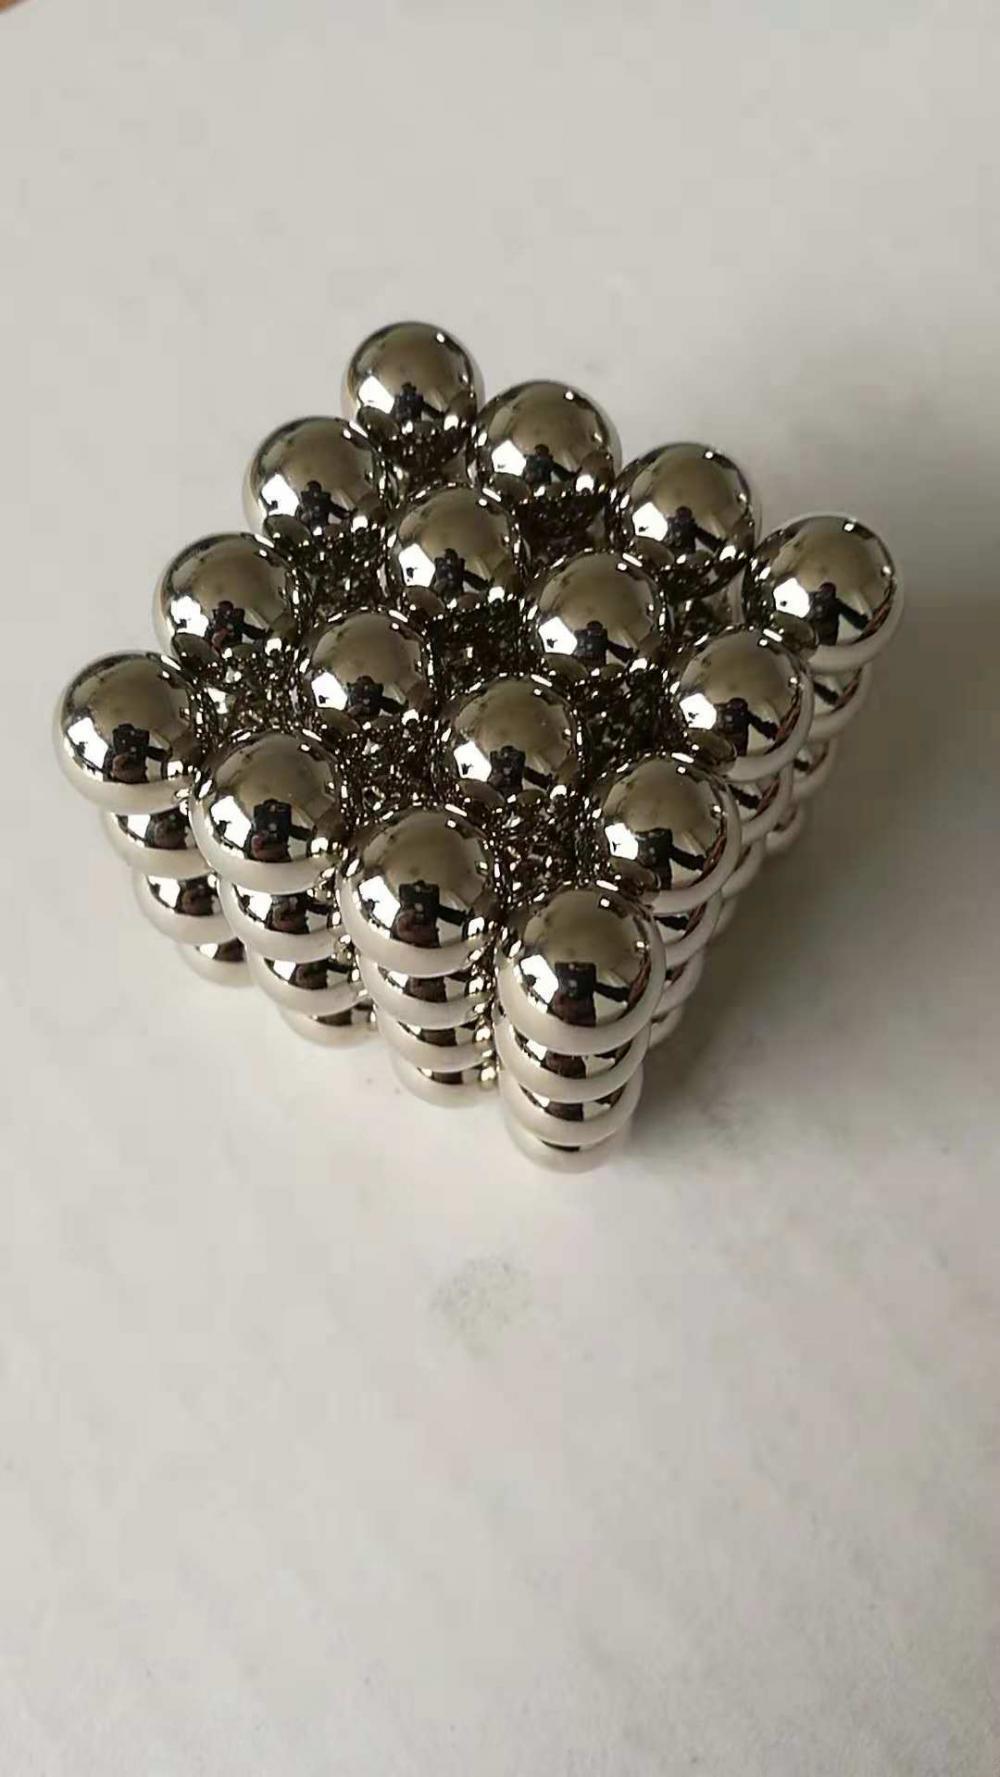 10mm Sphere Magnet